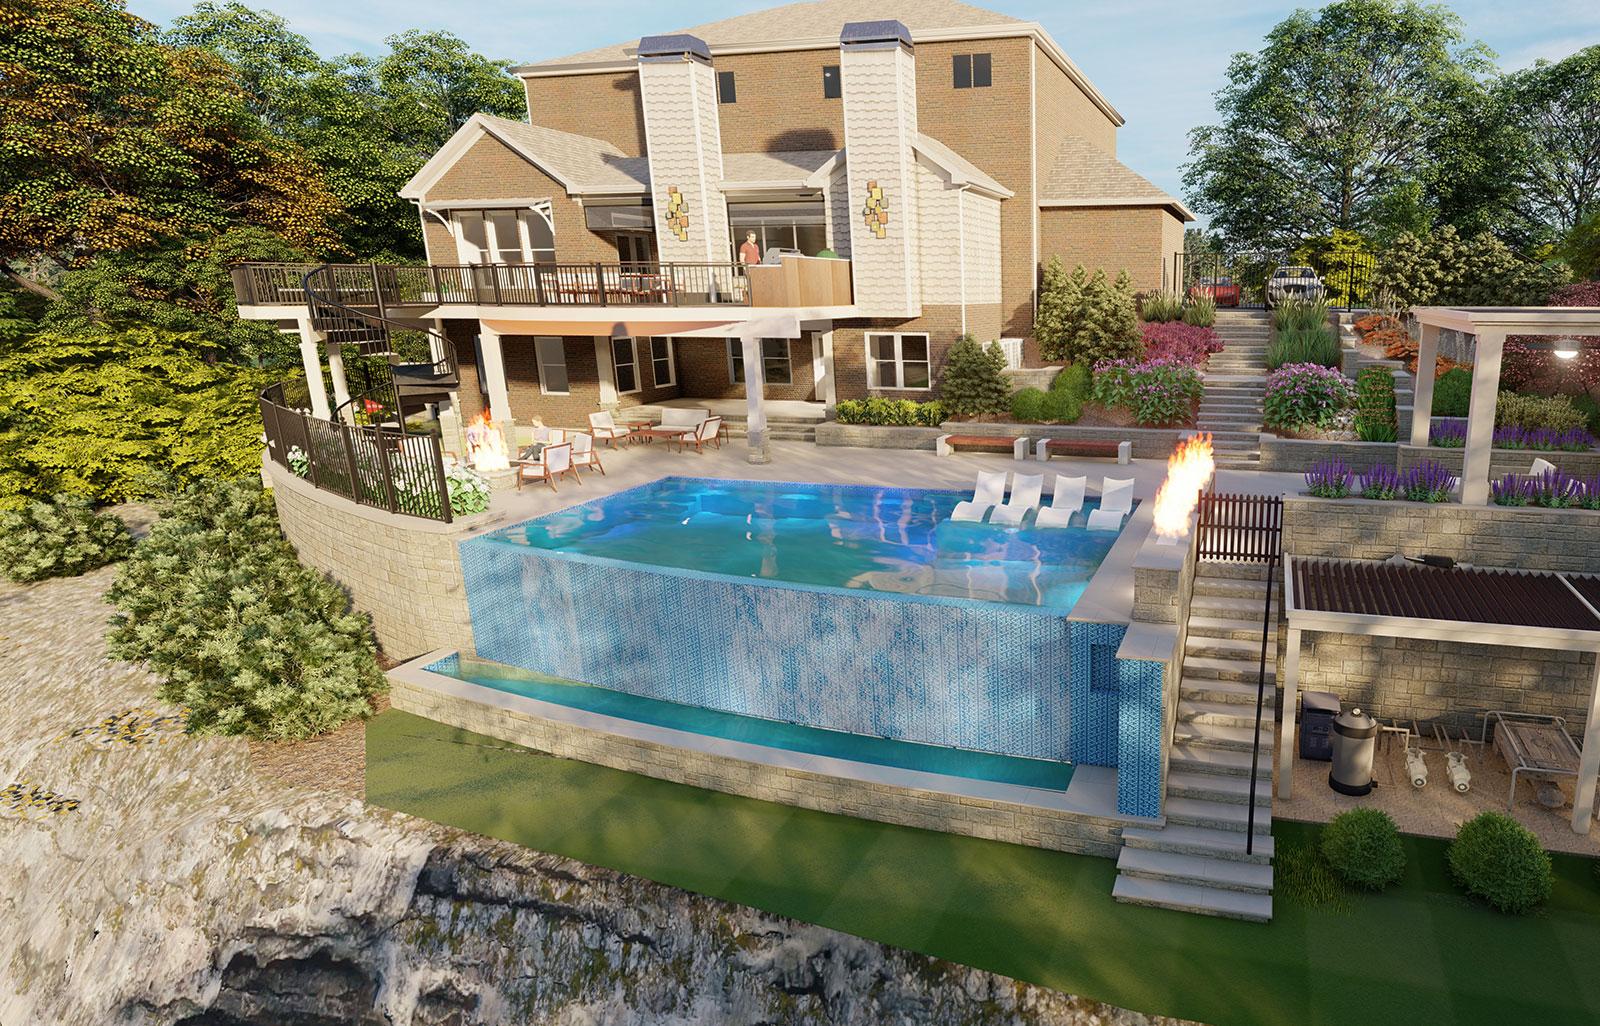 decksouth pool home